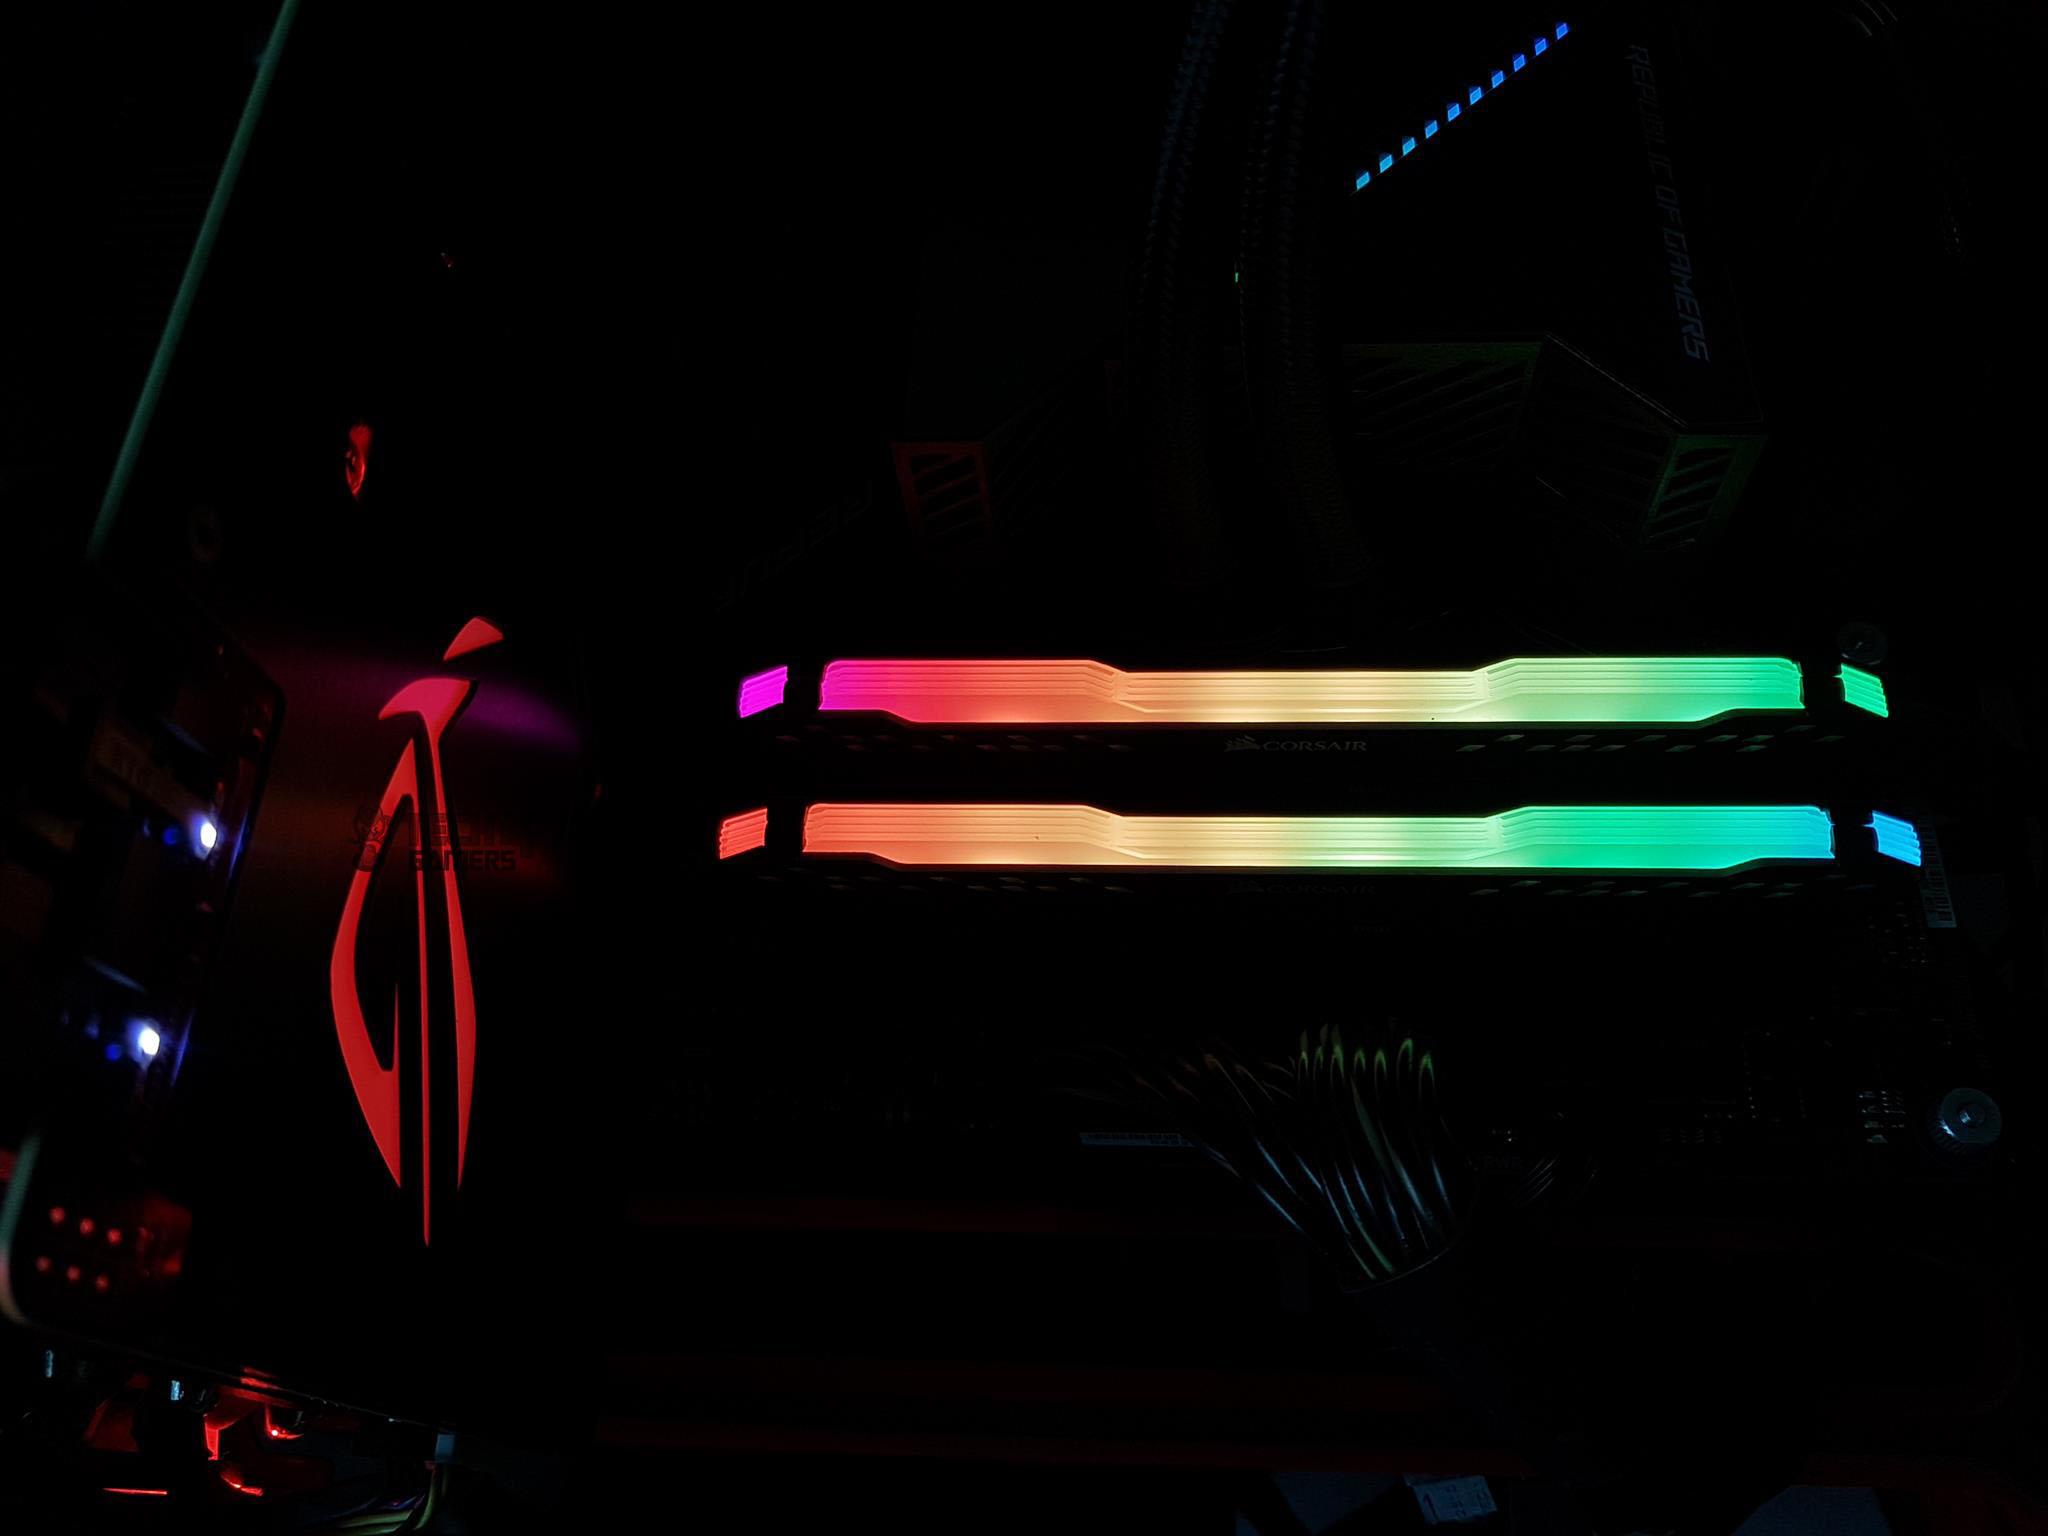 Corsair Vengeance RGB Pro 16GB @ 3200MHz Kit Review